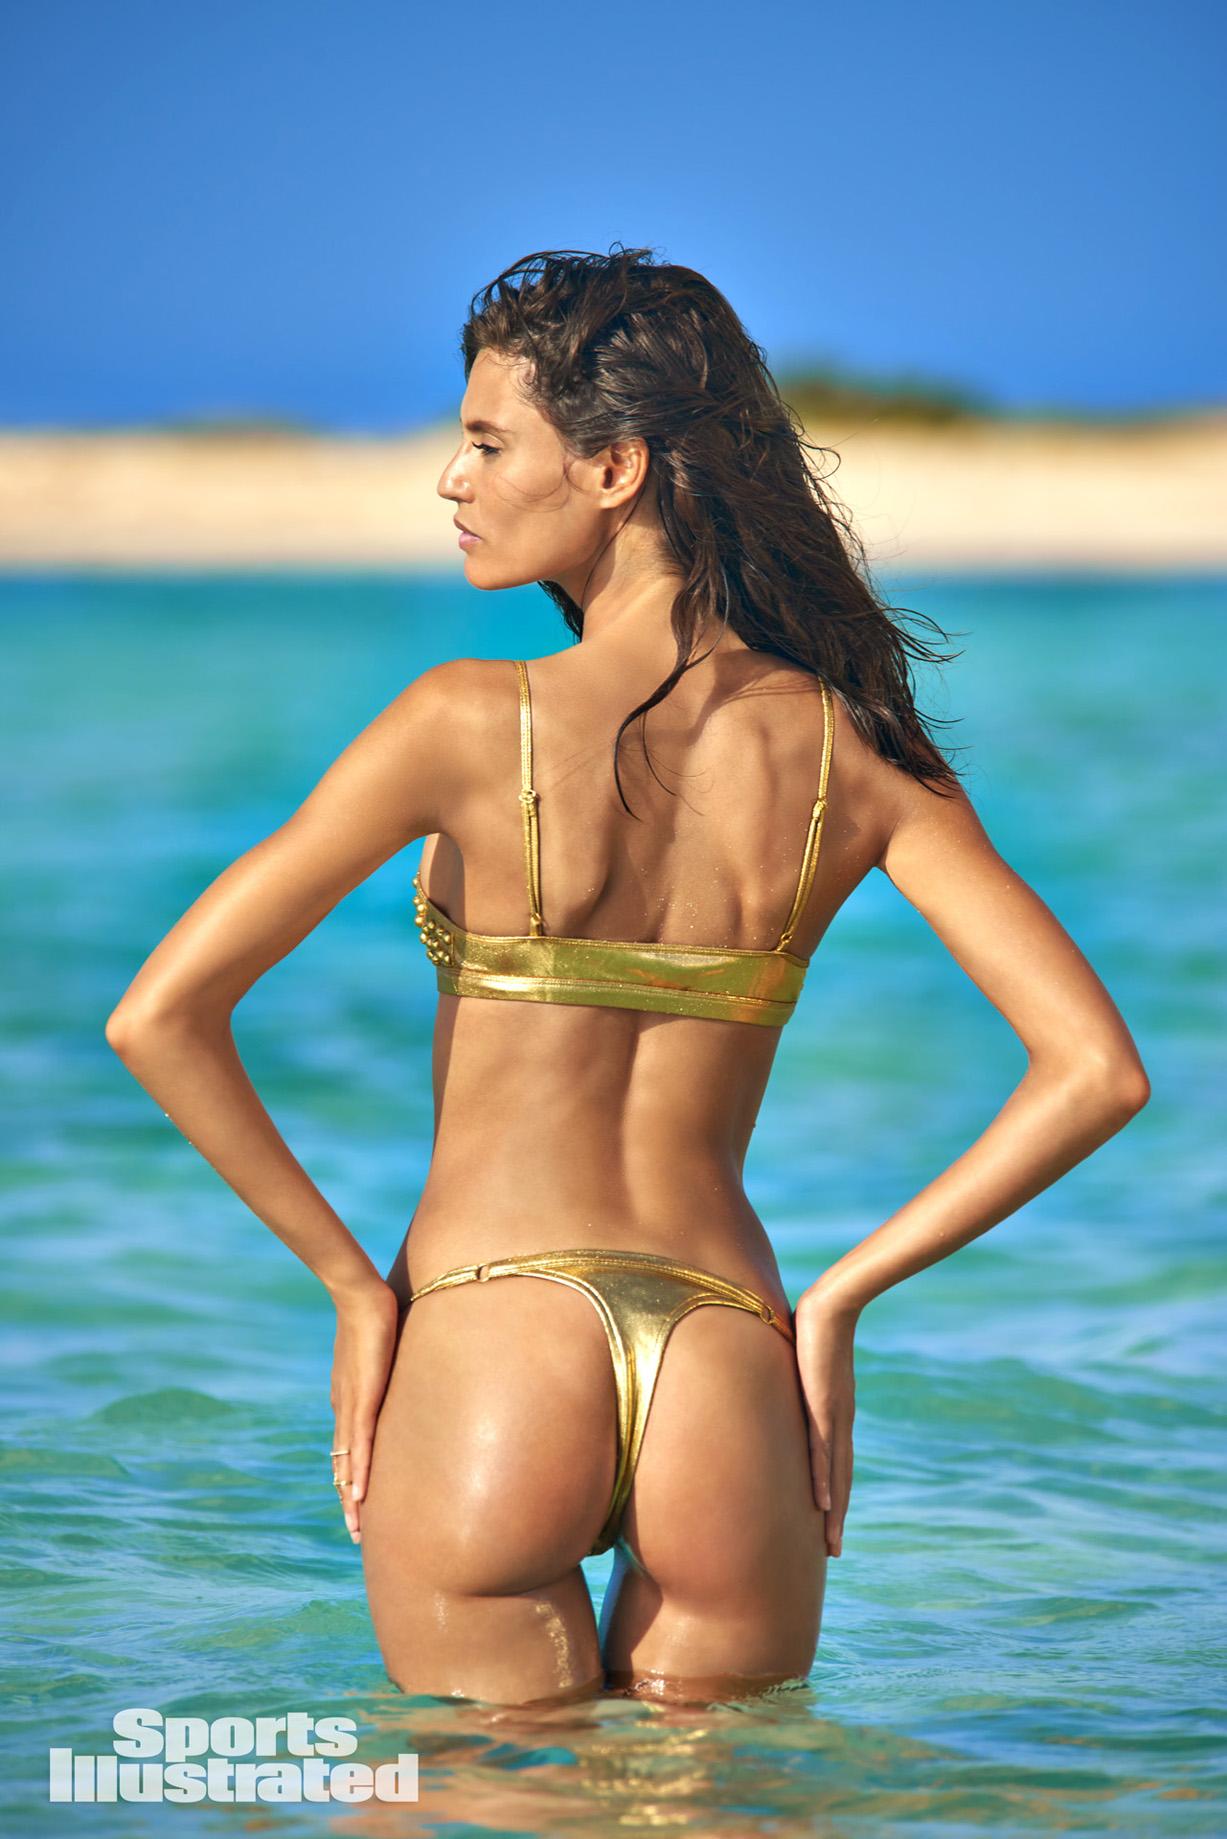 Bianca Balti / Бьянка Бэлти в купальниках из новой коллекции Sports Illustrated Swimsuit 2018 issue / in Aruba by Yu Tsai